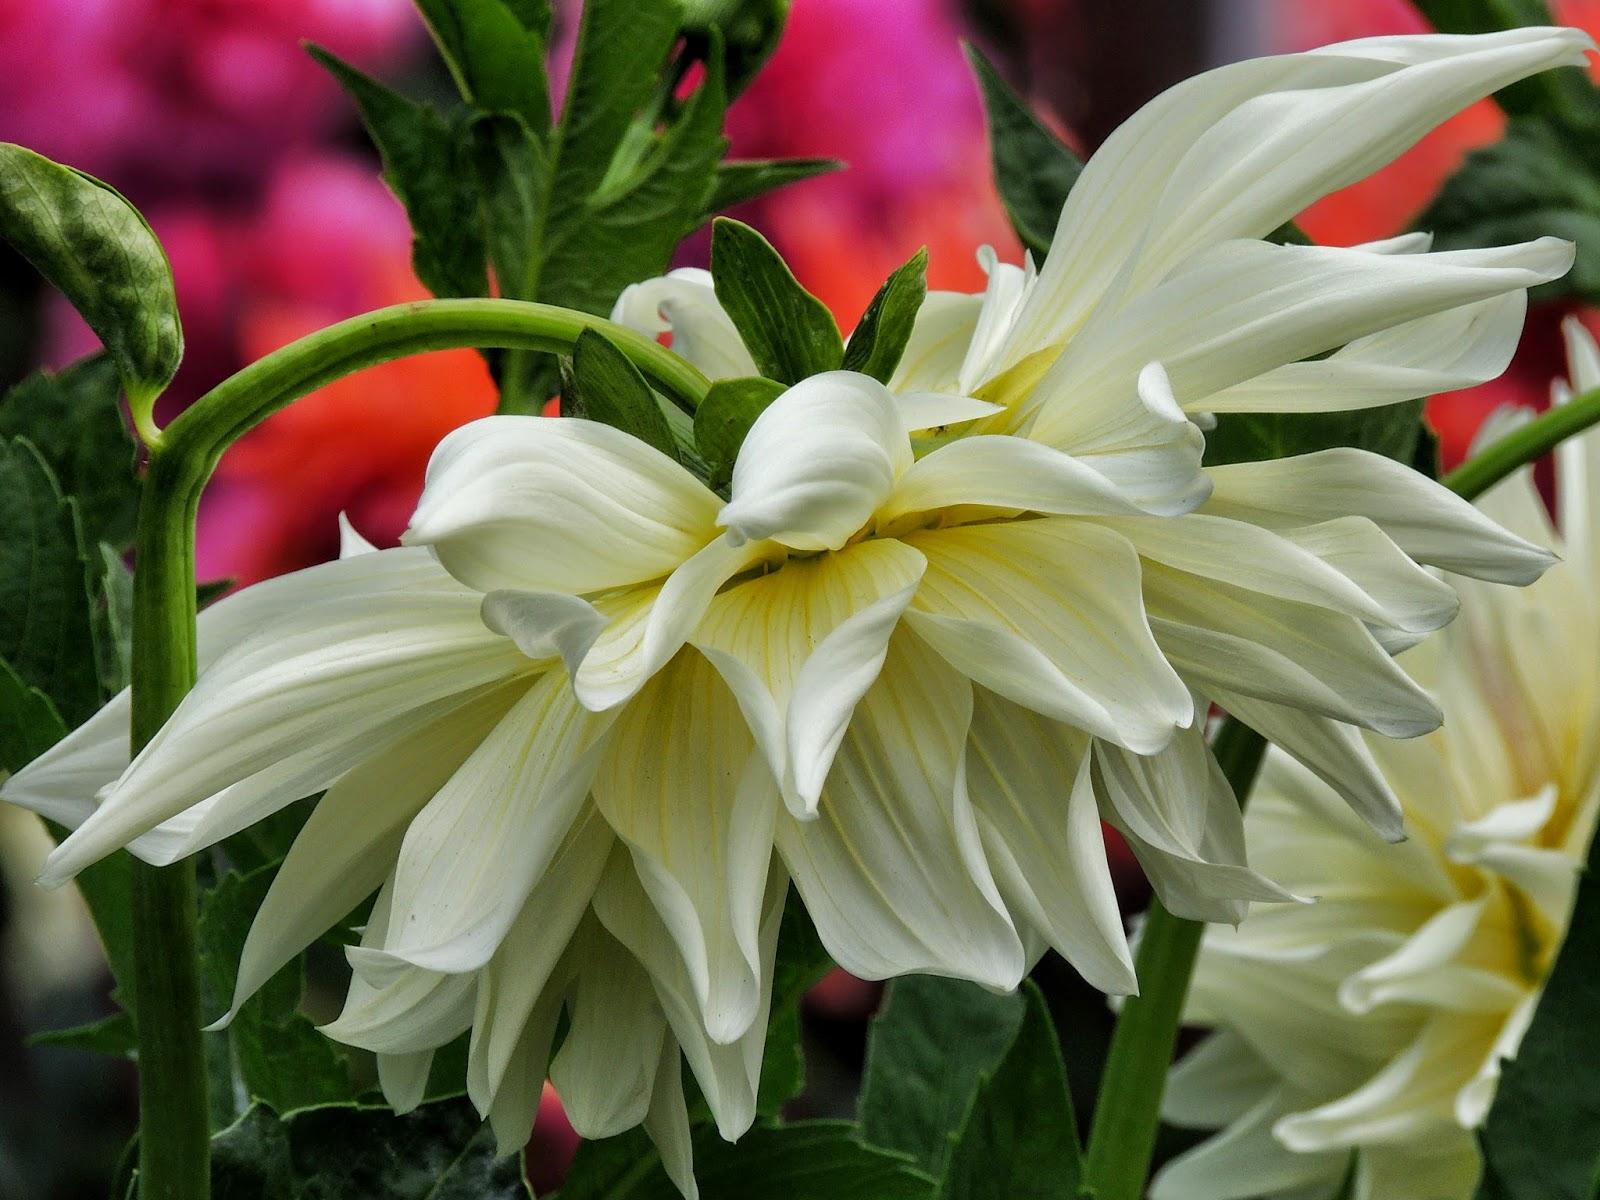 Princess haiku december 2014 a white flower perfection said princess haiku izmirmasajfo